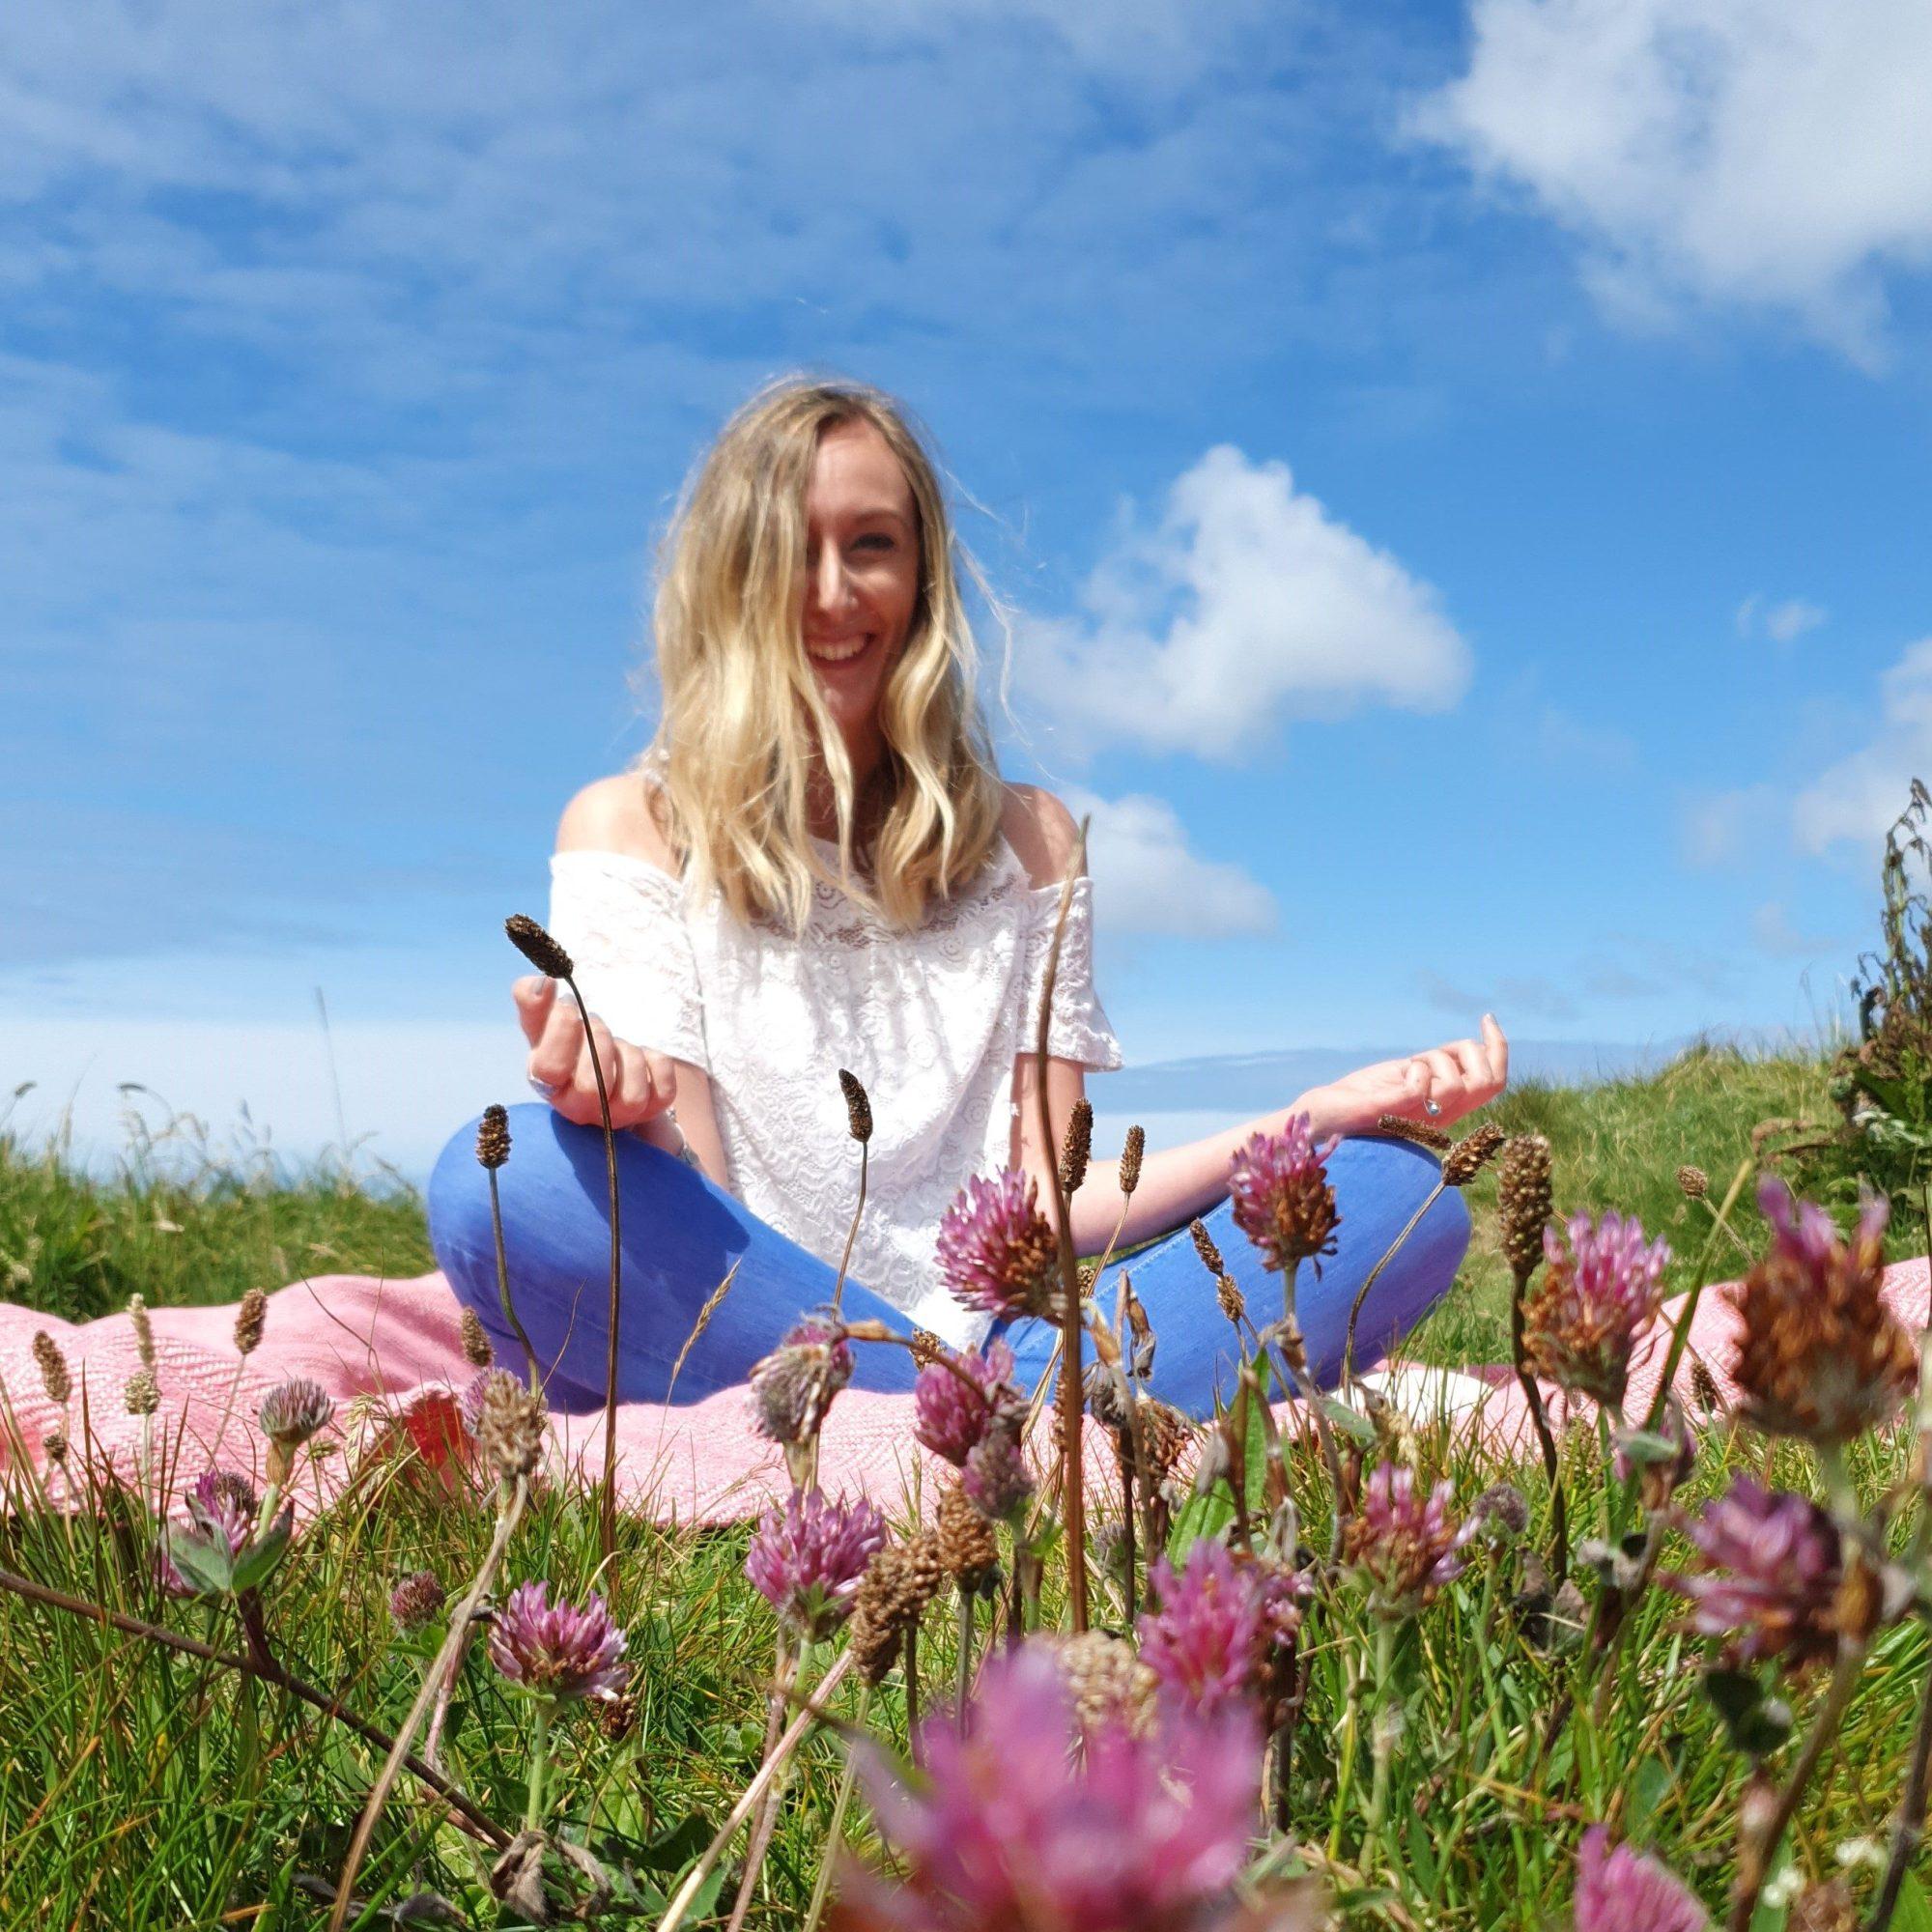 Amy Psychic Medium in Meditation